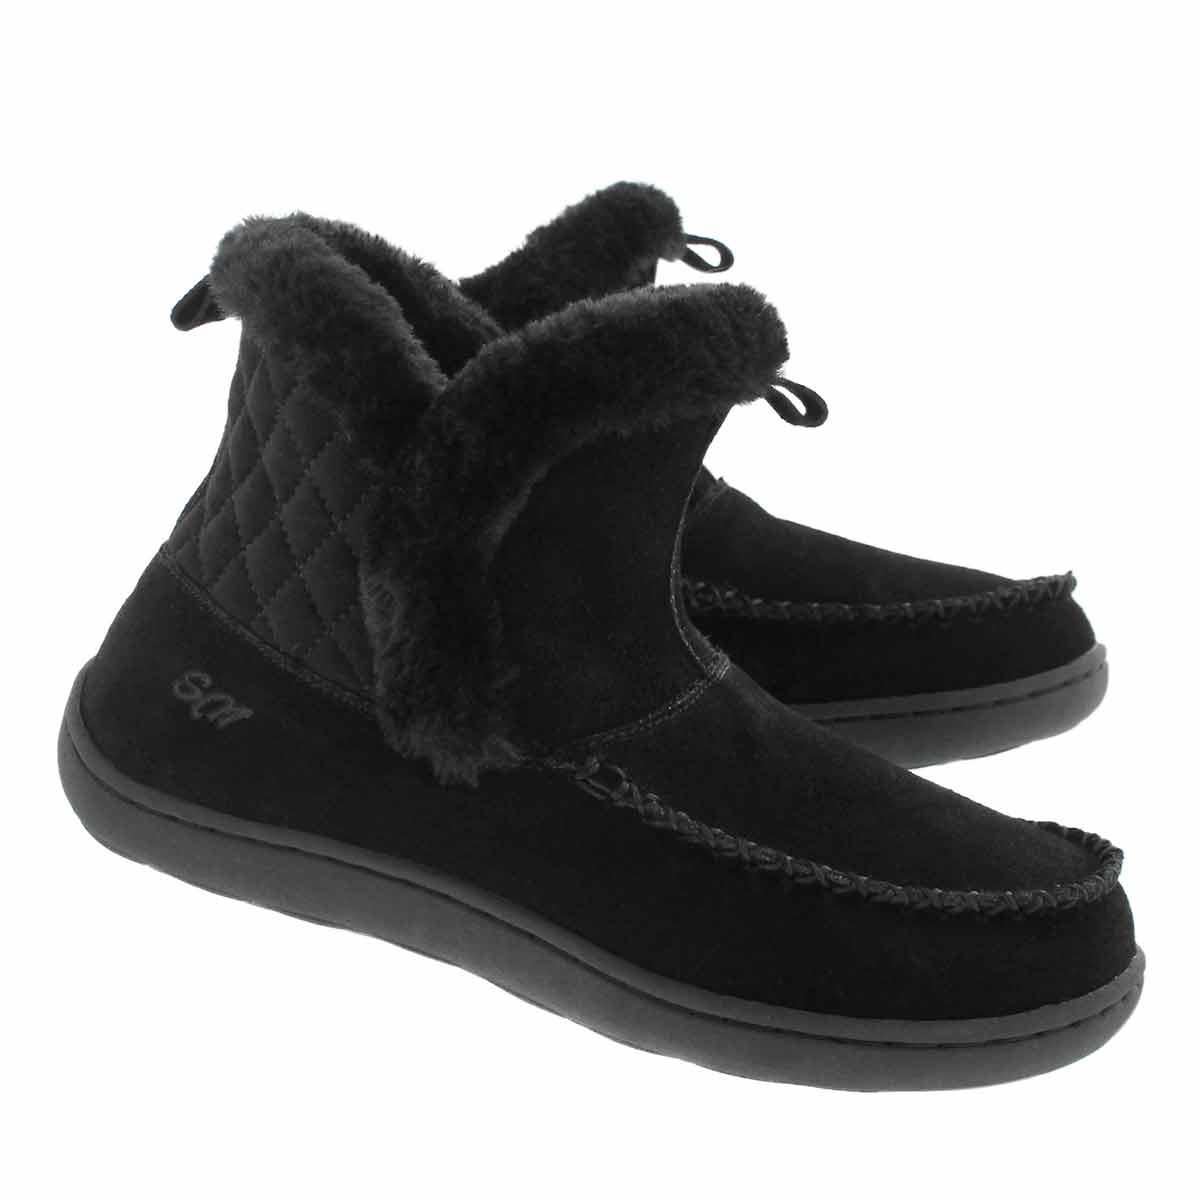 Lds Phoebe Lo blk suede slipper bootie